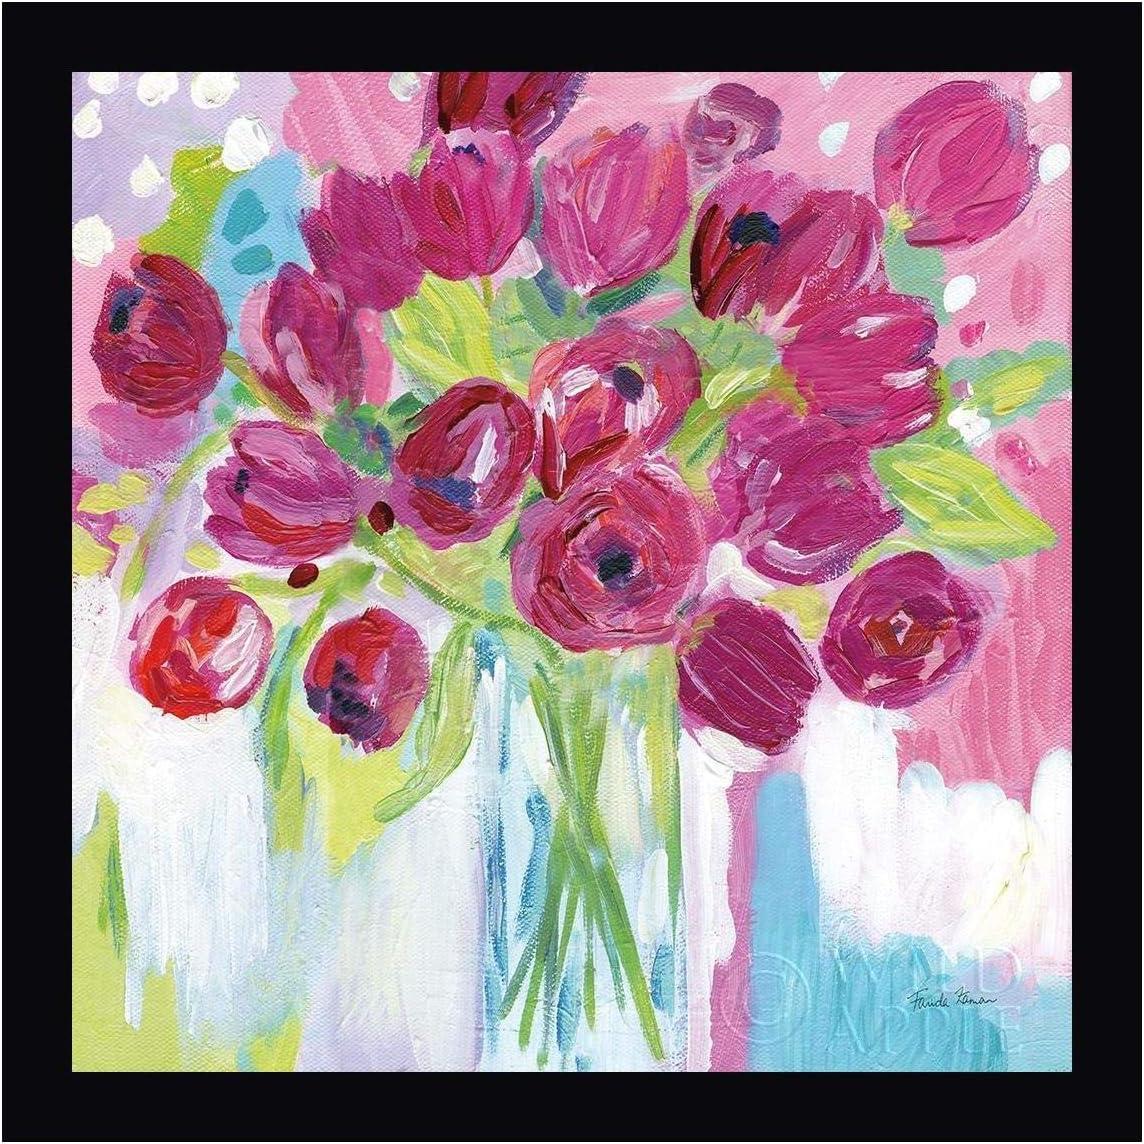 Joyful Tulips by Farida Zaman - Canvas Max 47% OFF List price Framed 20